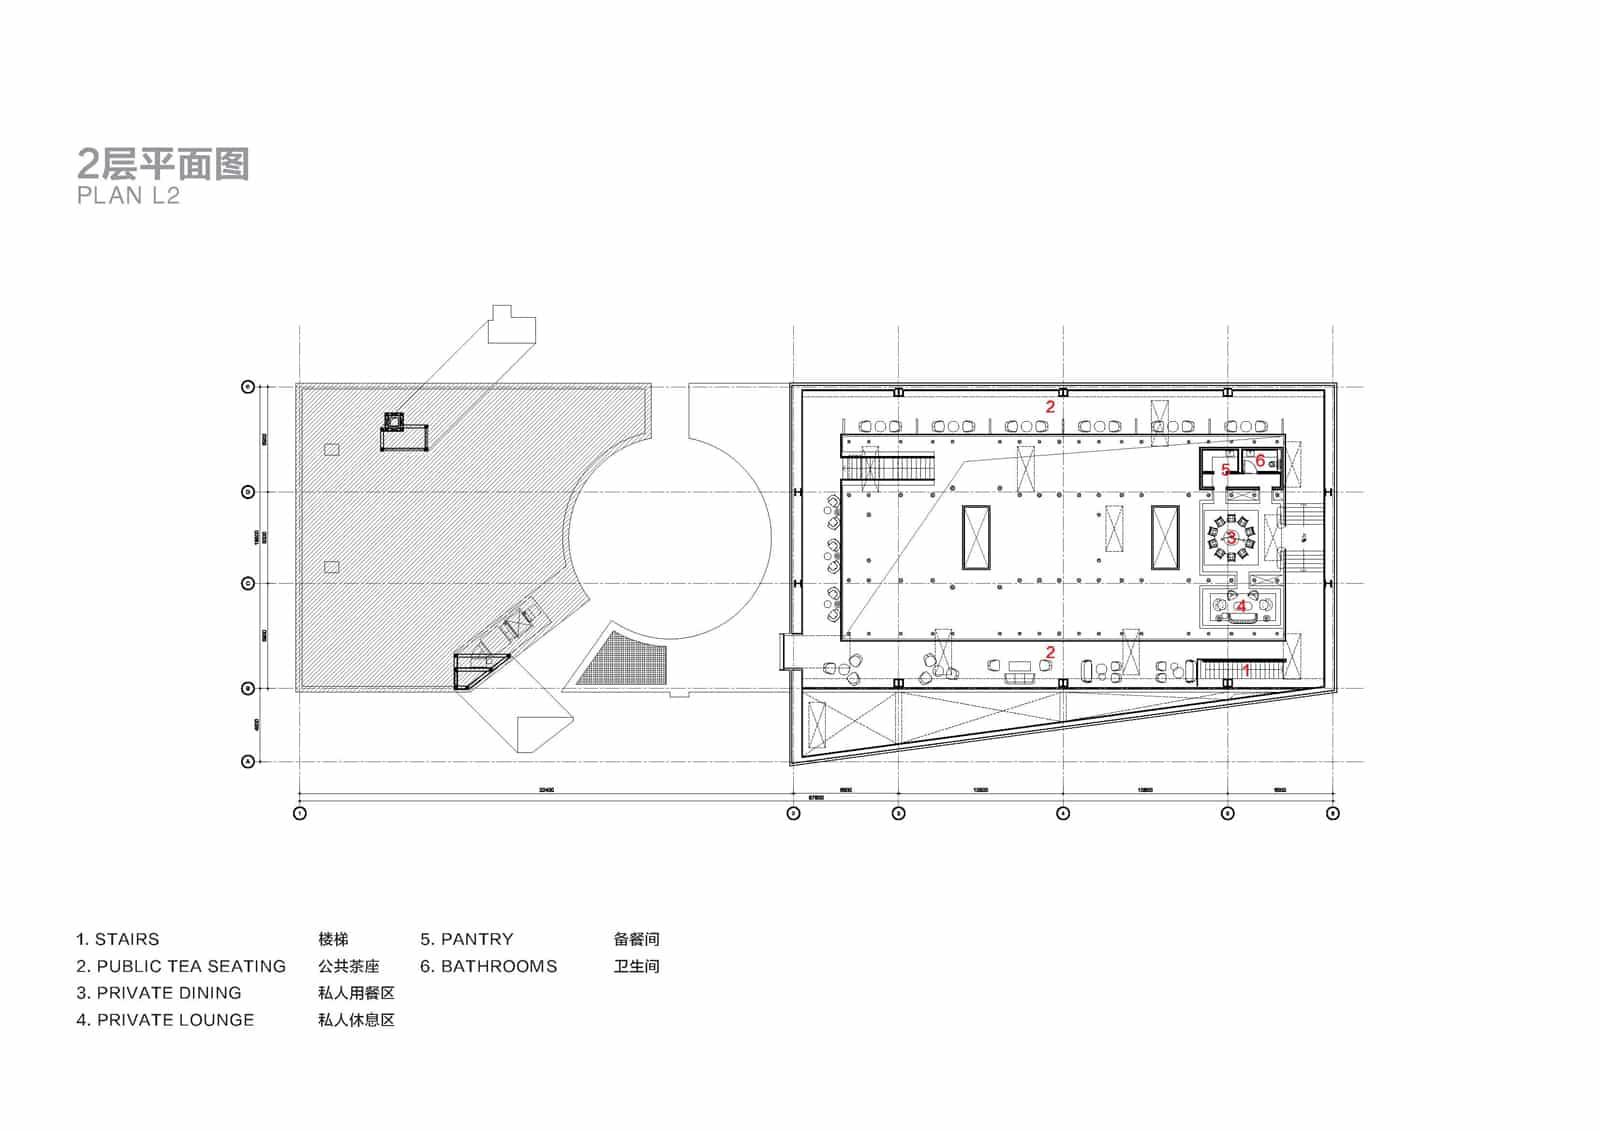 Fuzhou Teahouse  - 20210809 NeriHu FuzhouTeahouse 09.2.3 58